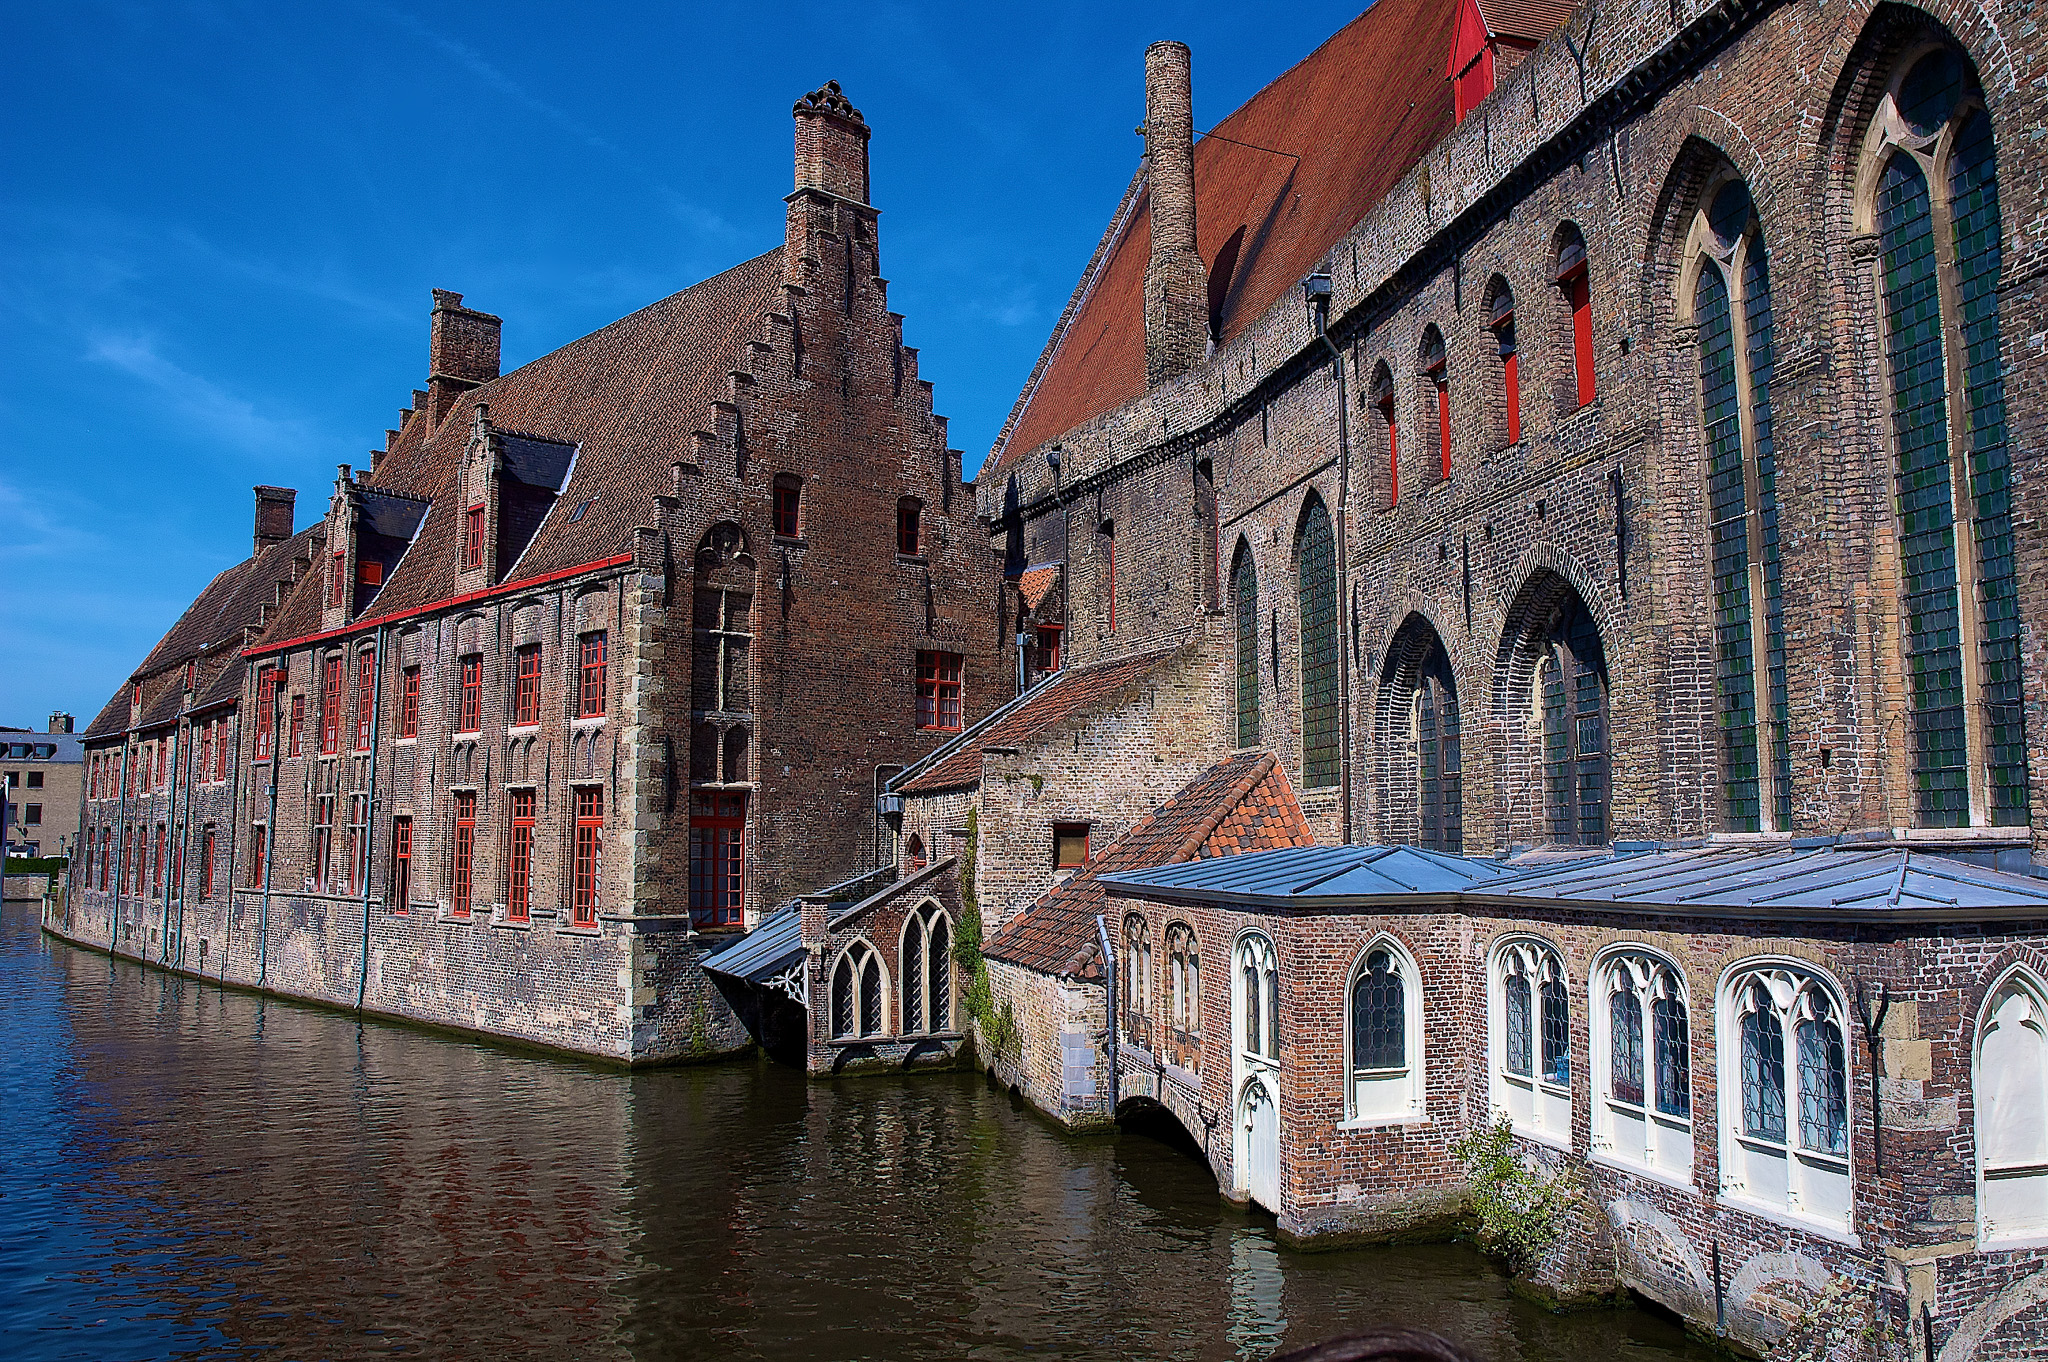 St. John's Hospital, Brugge